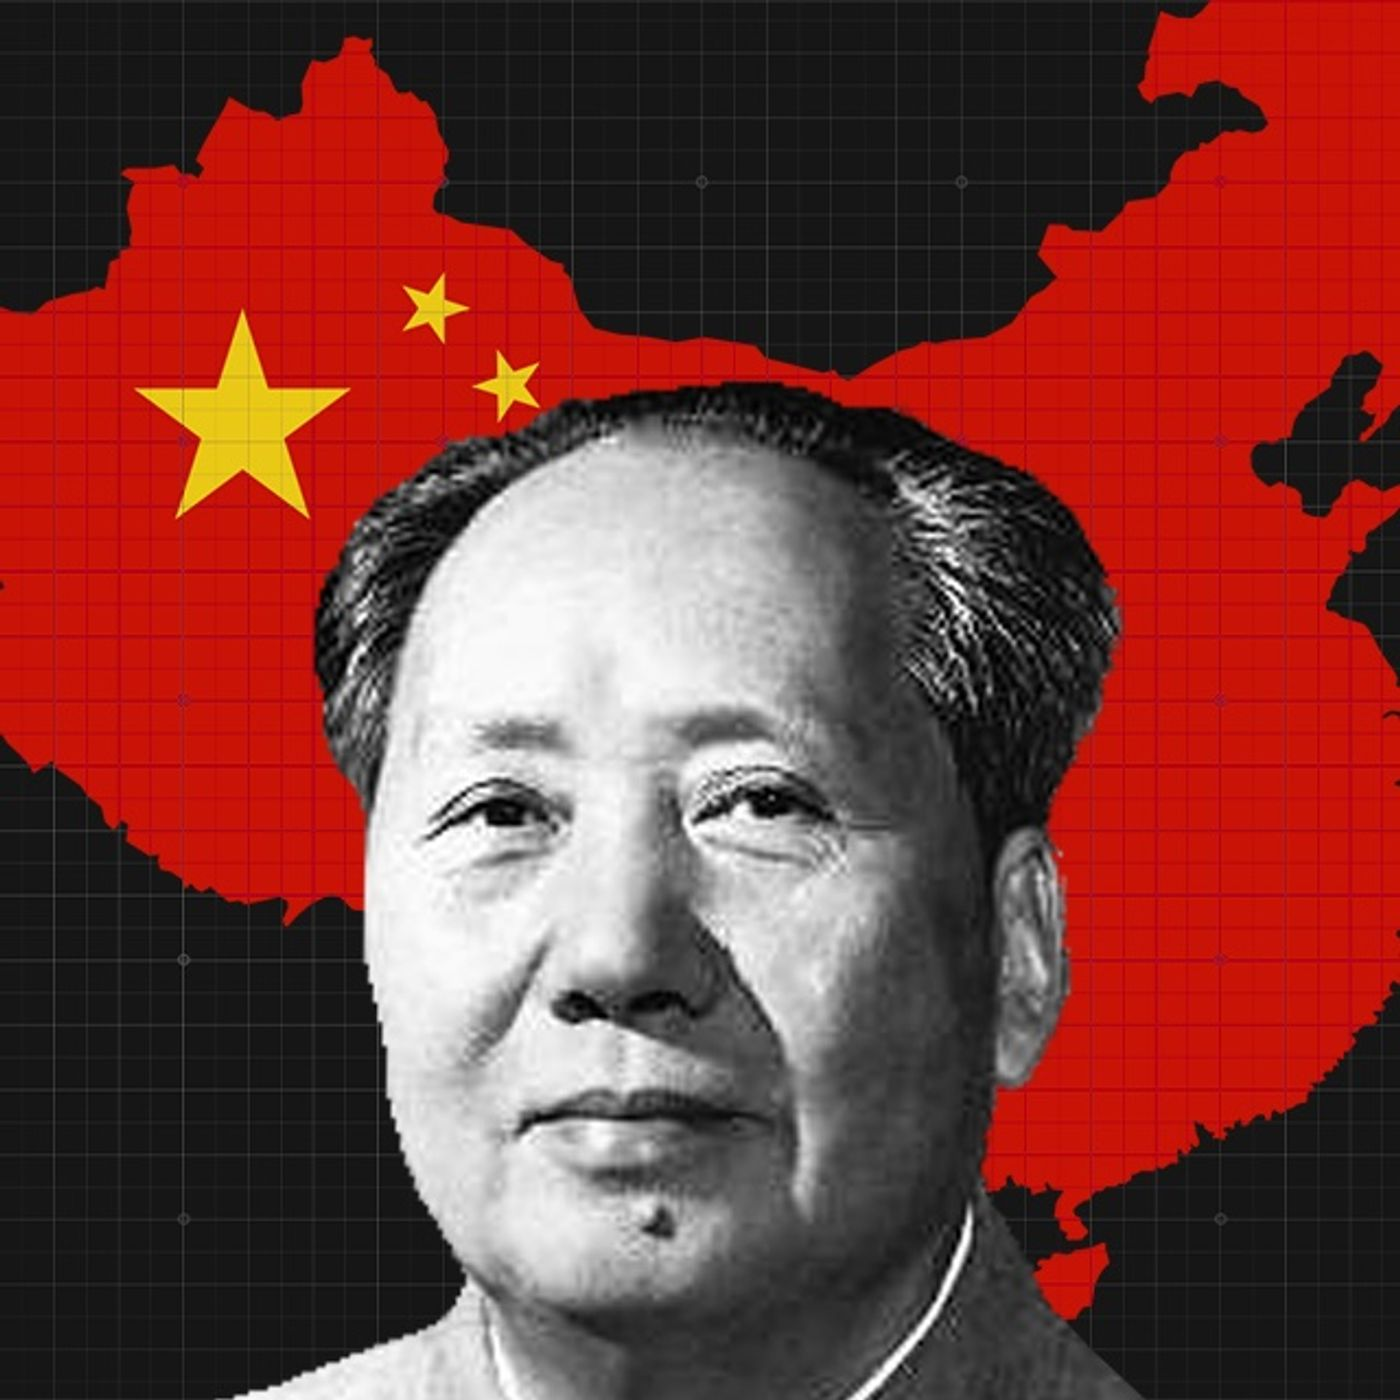 L'ascesa della Cina Comunista: Da Mao a Xi Jinping